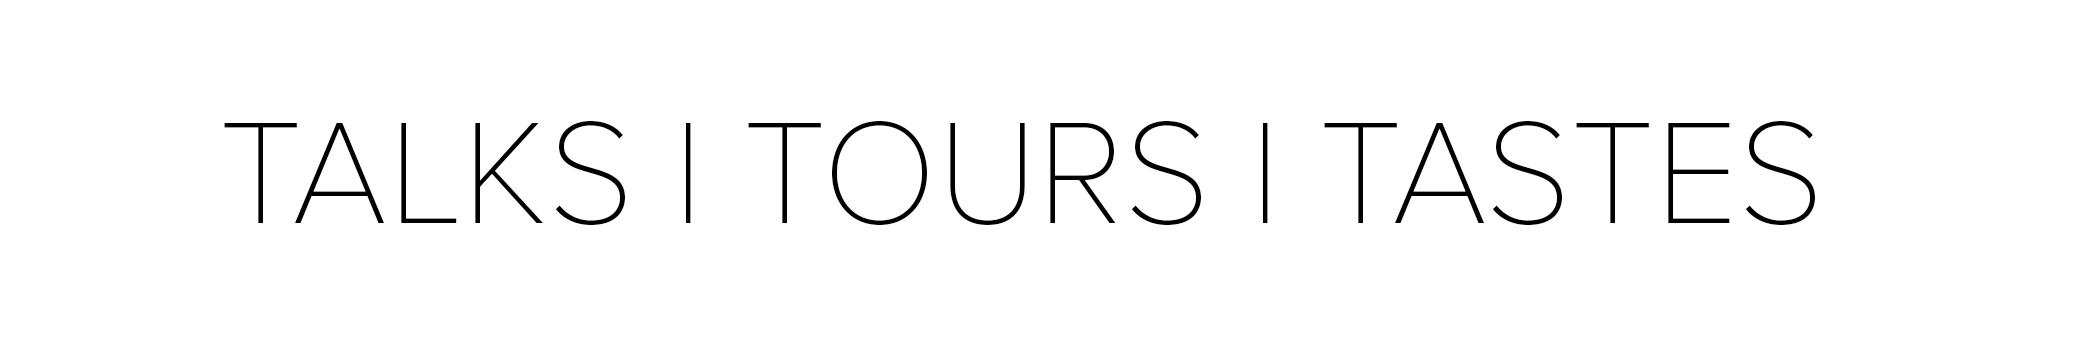 Talks - Tours - Tastes2.png